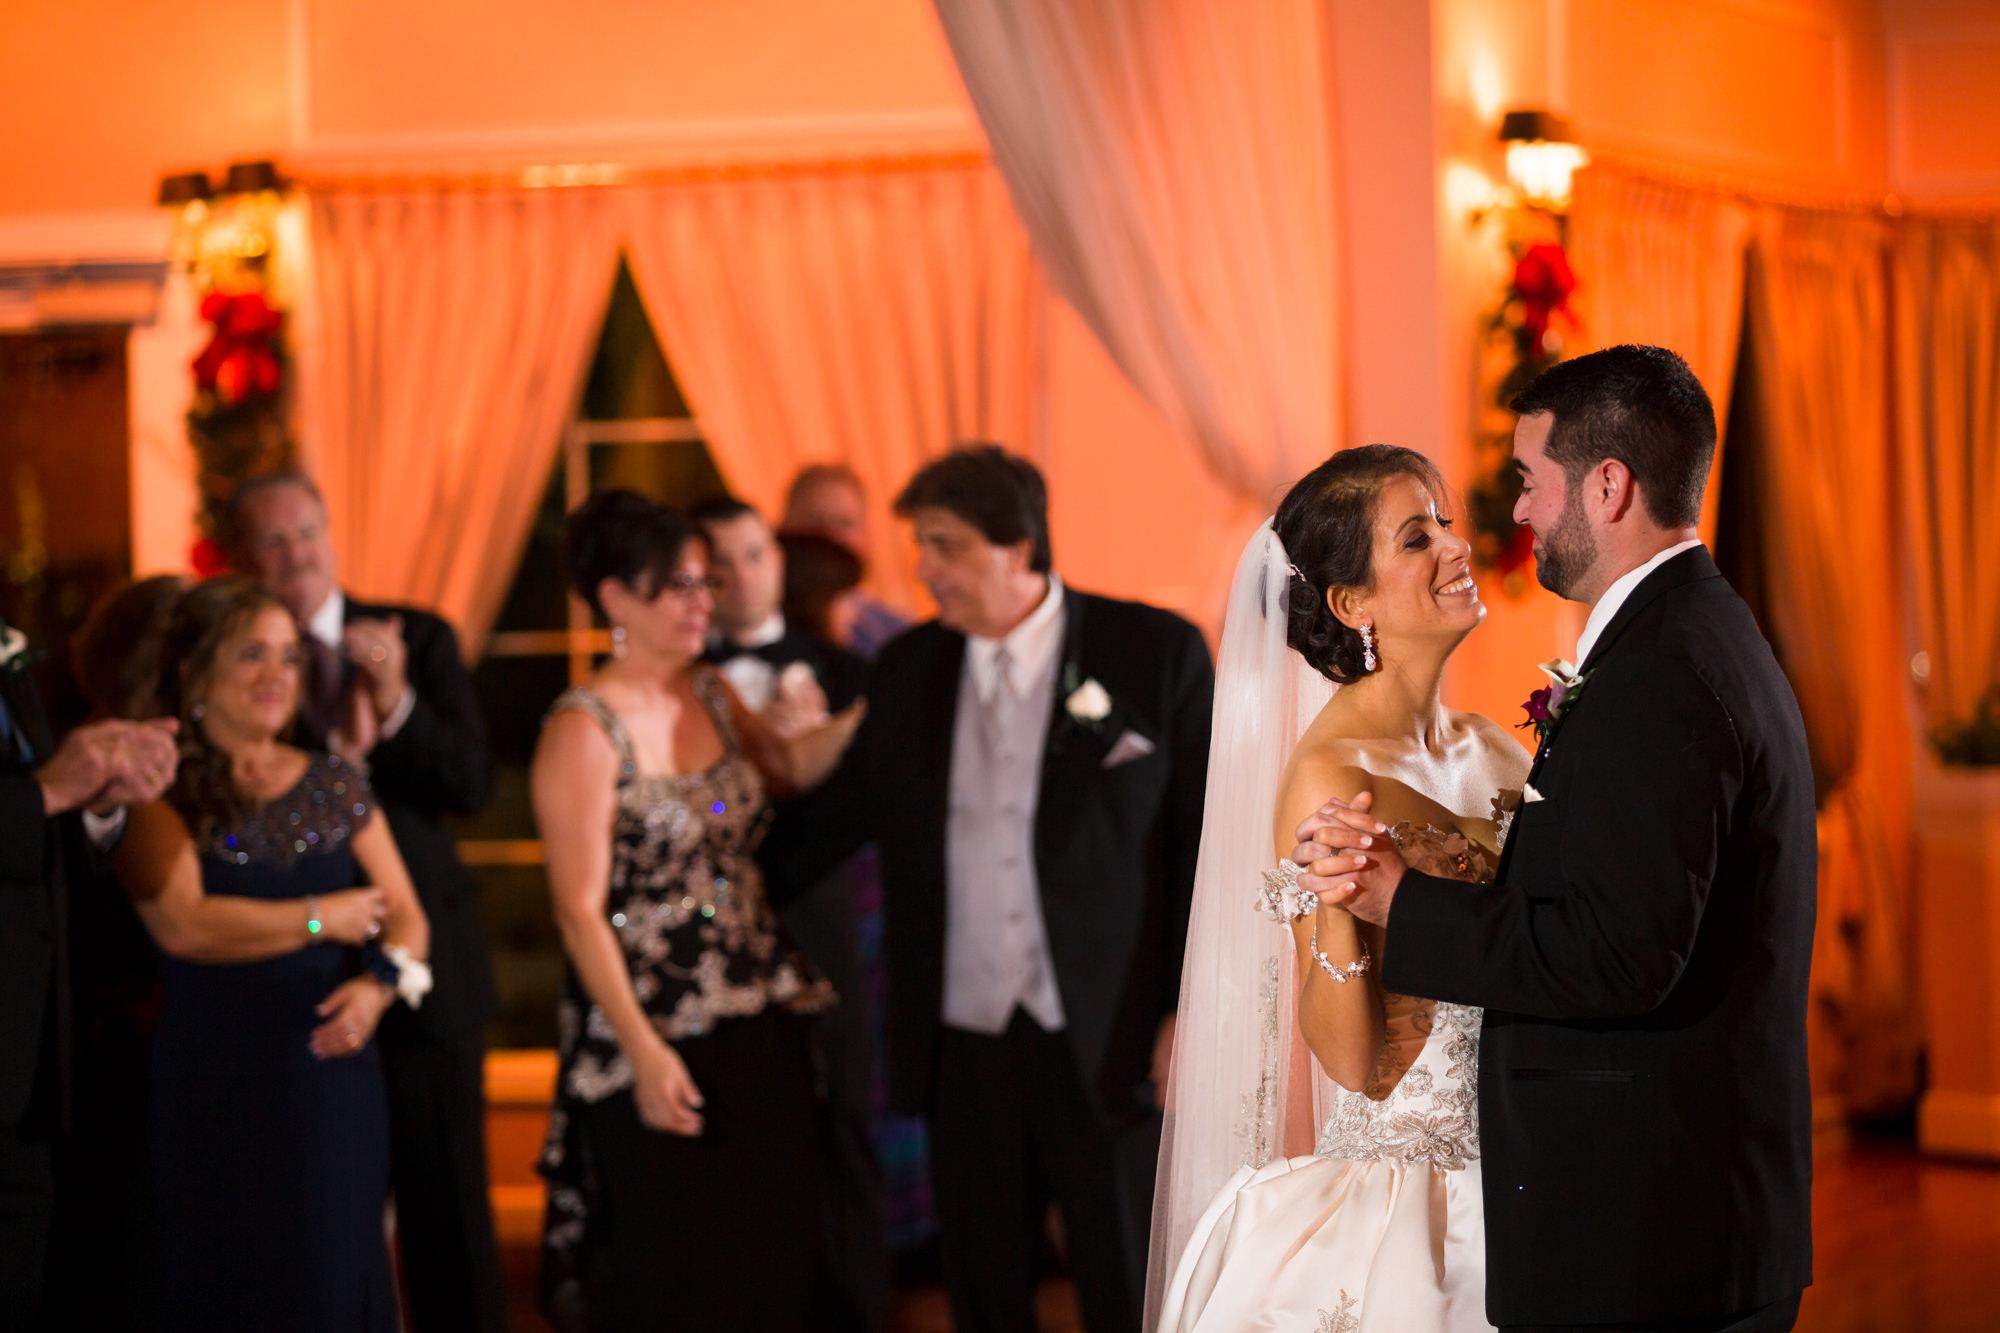 Benvenuto_Wedding_catholic_Florida_Bride-Groom-109.jpg